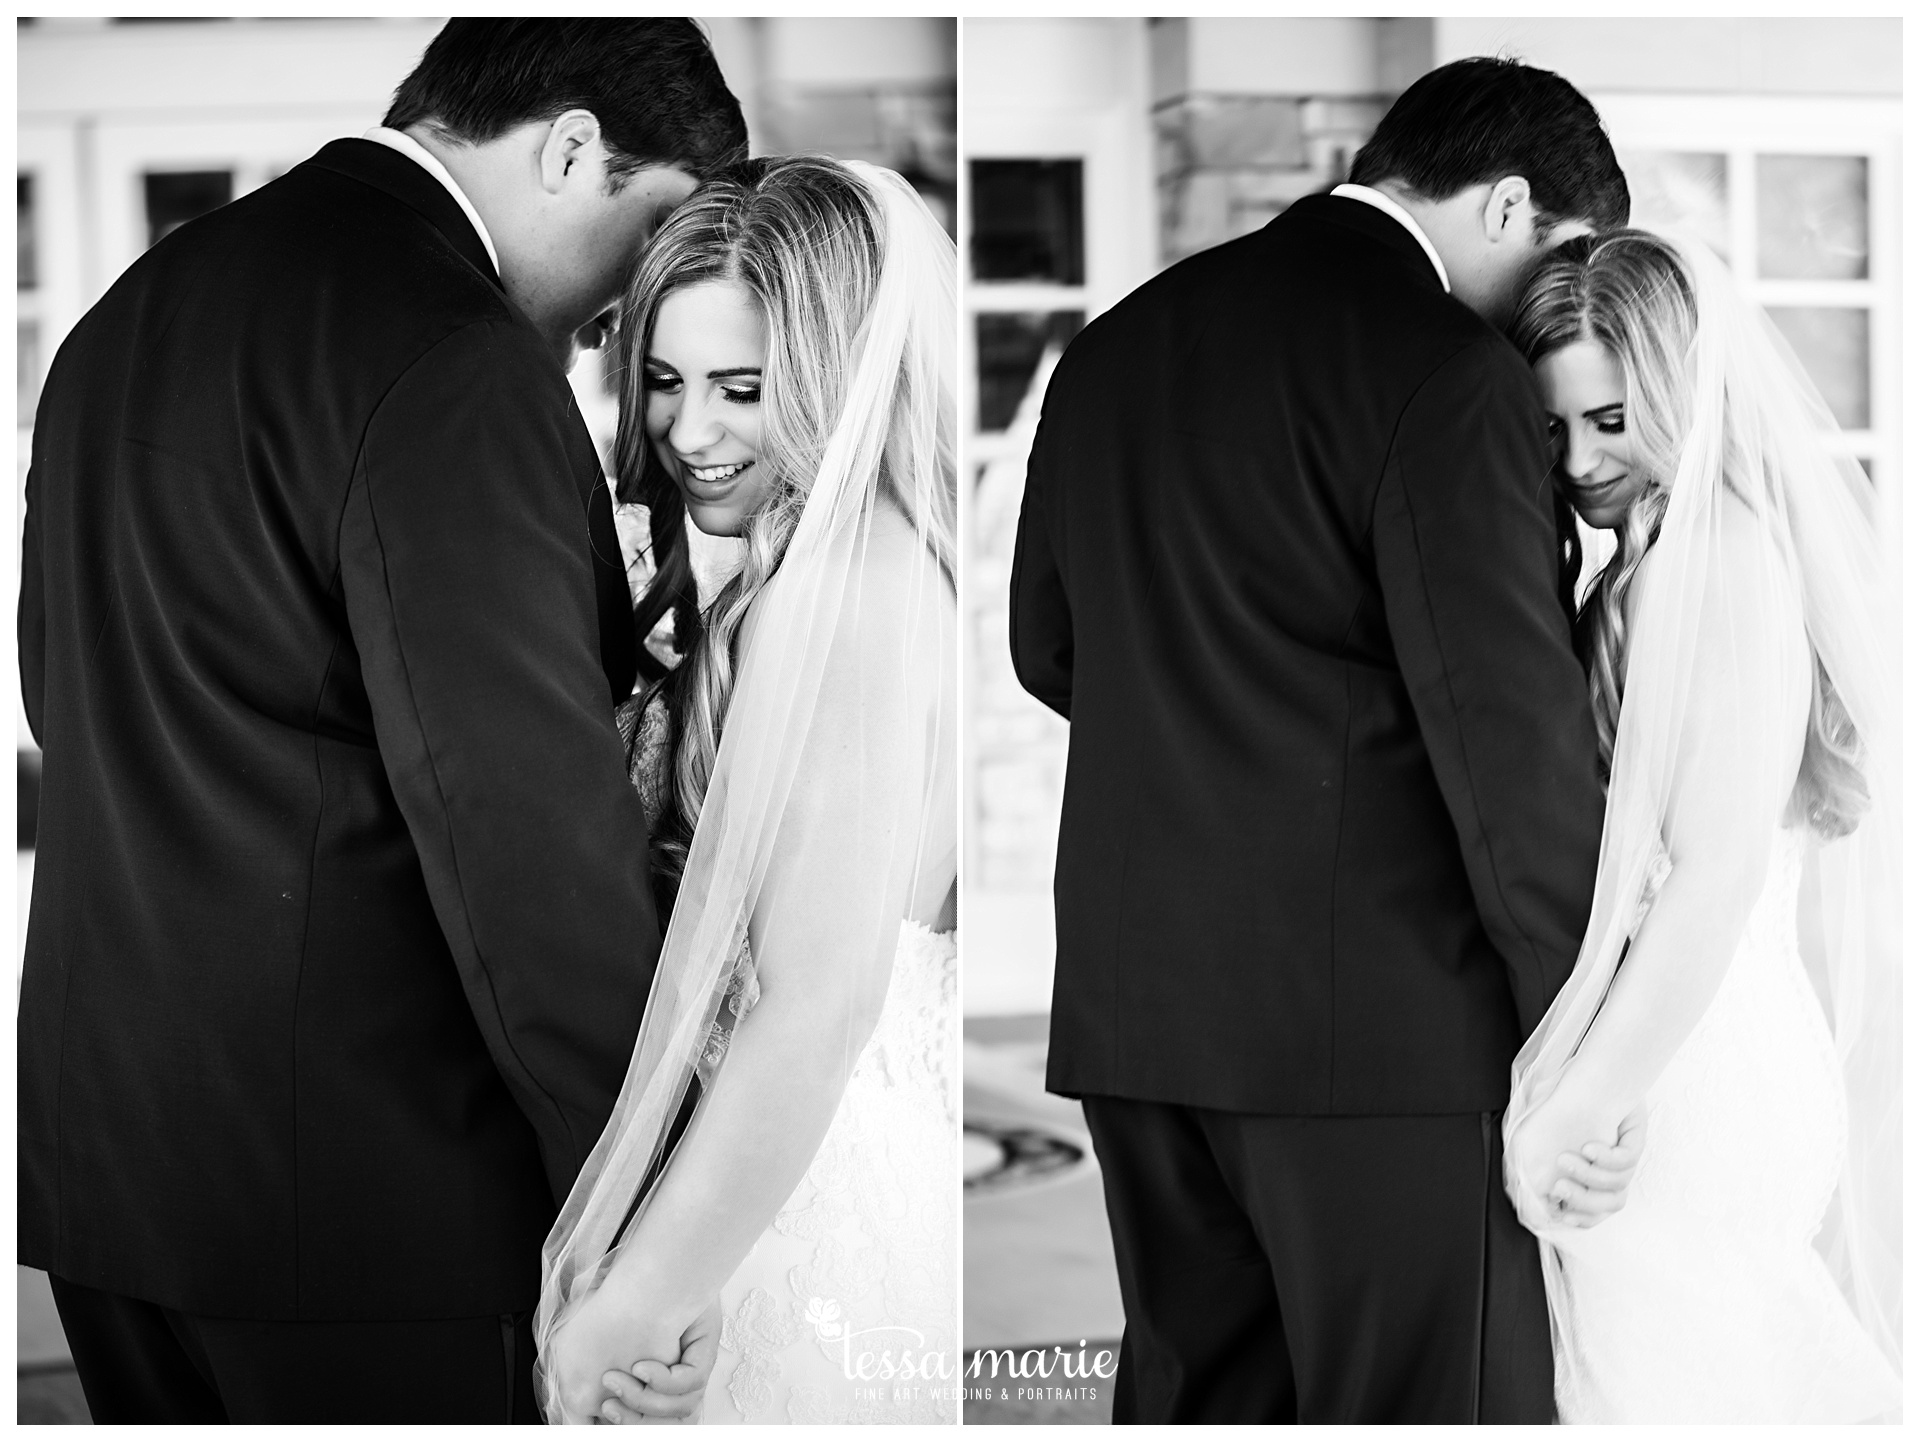 tessa_marie_weddings_legacy_story_focused_wedding_pictures_atlanta_wedding_photographer_0089